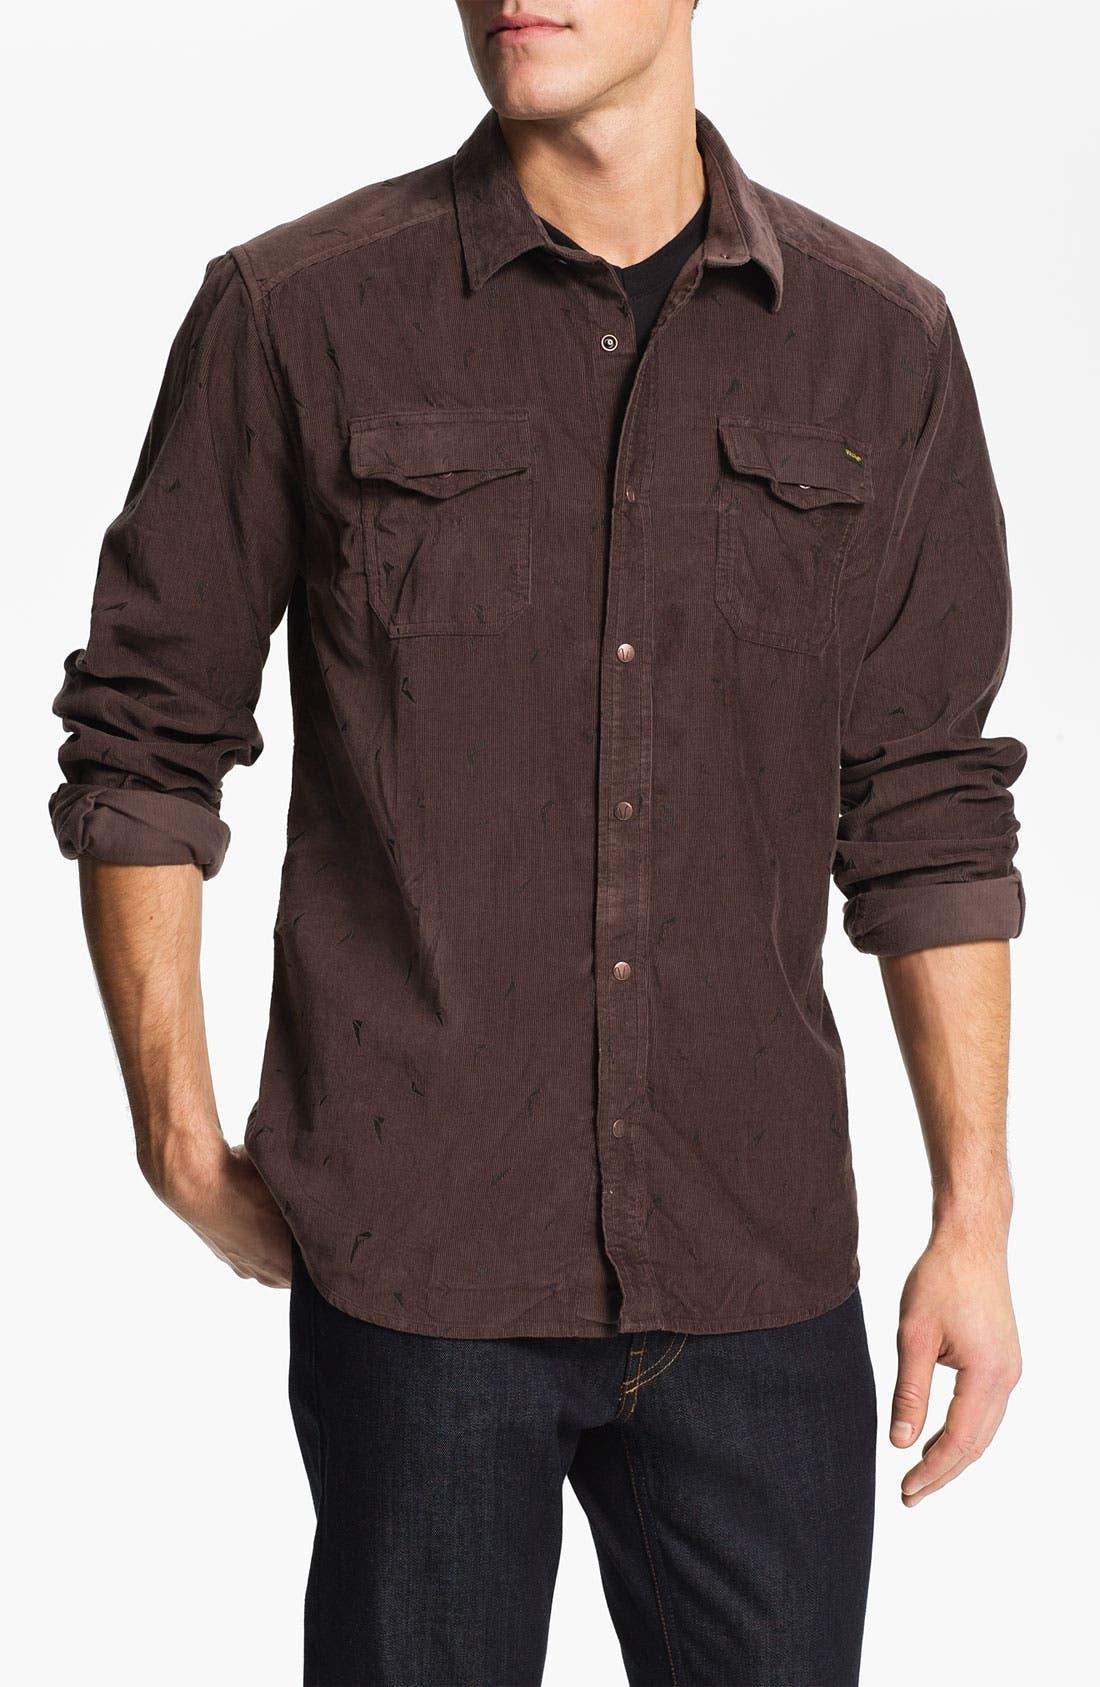 Alternate Image 1 Selected - Volcom 'Stacked' Corduroy Shirt